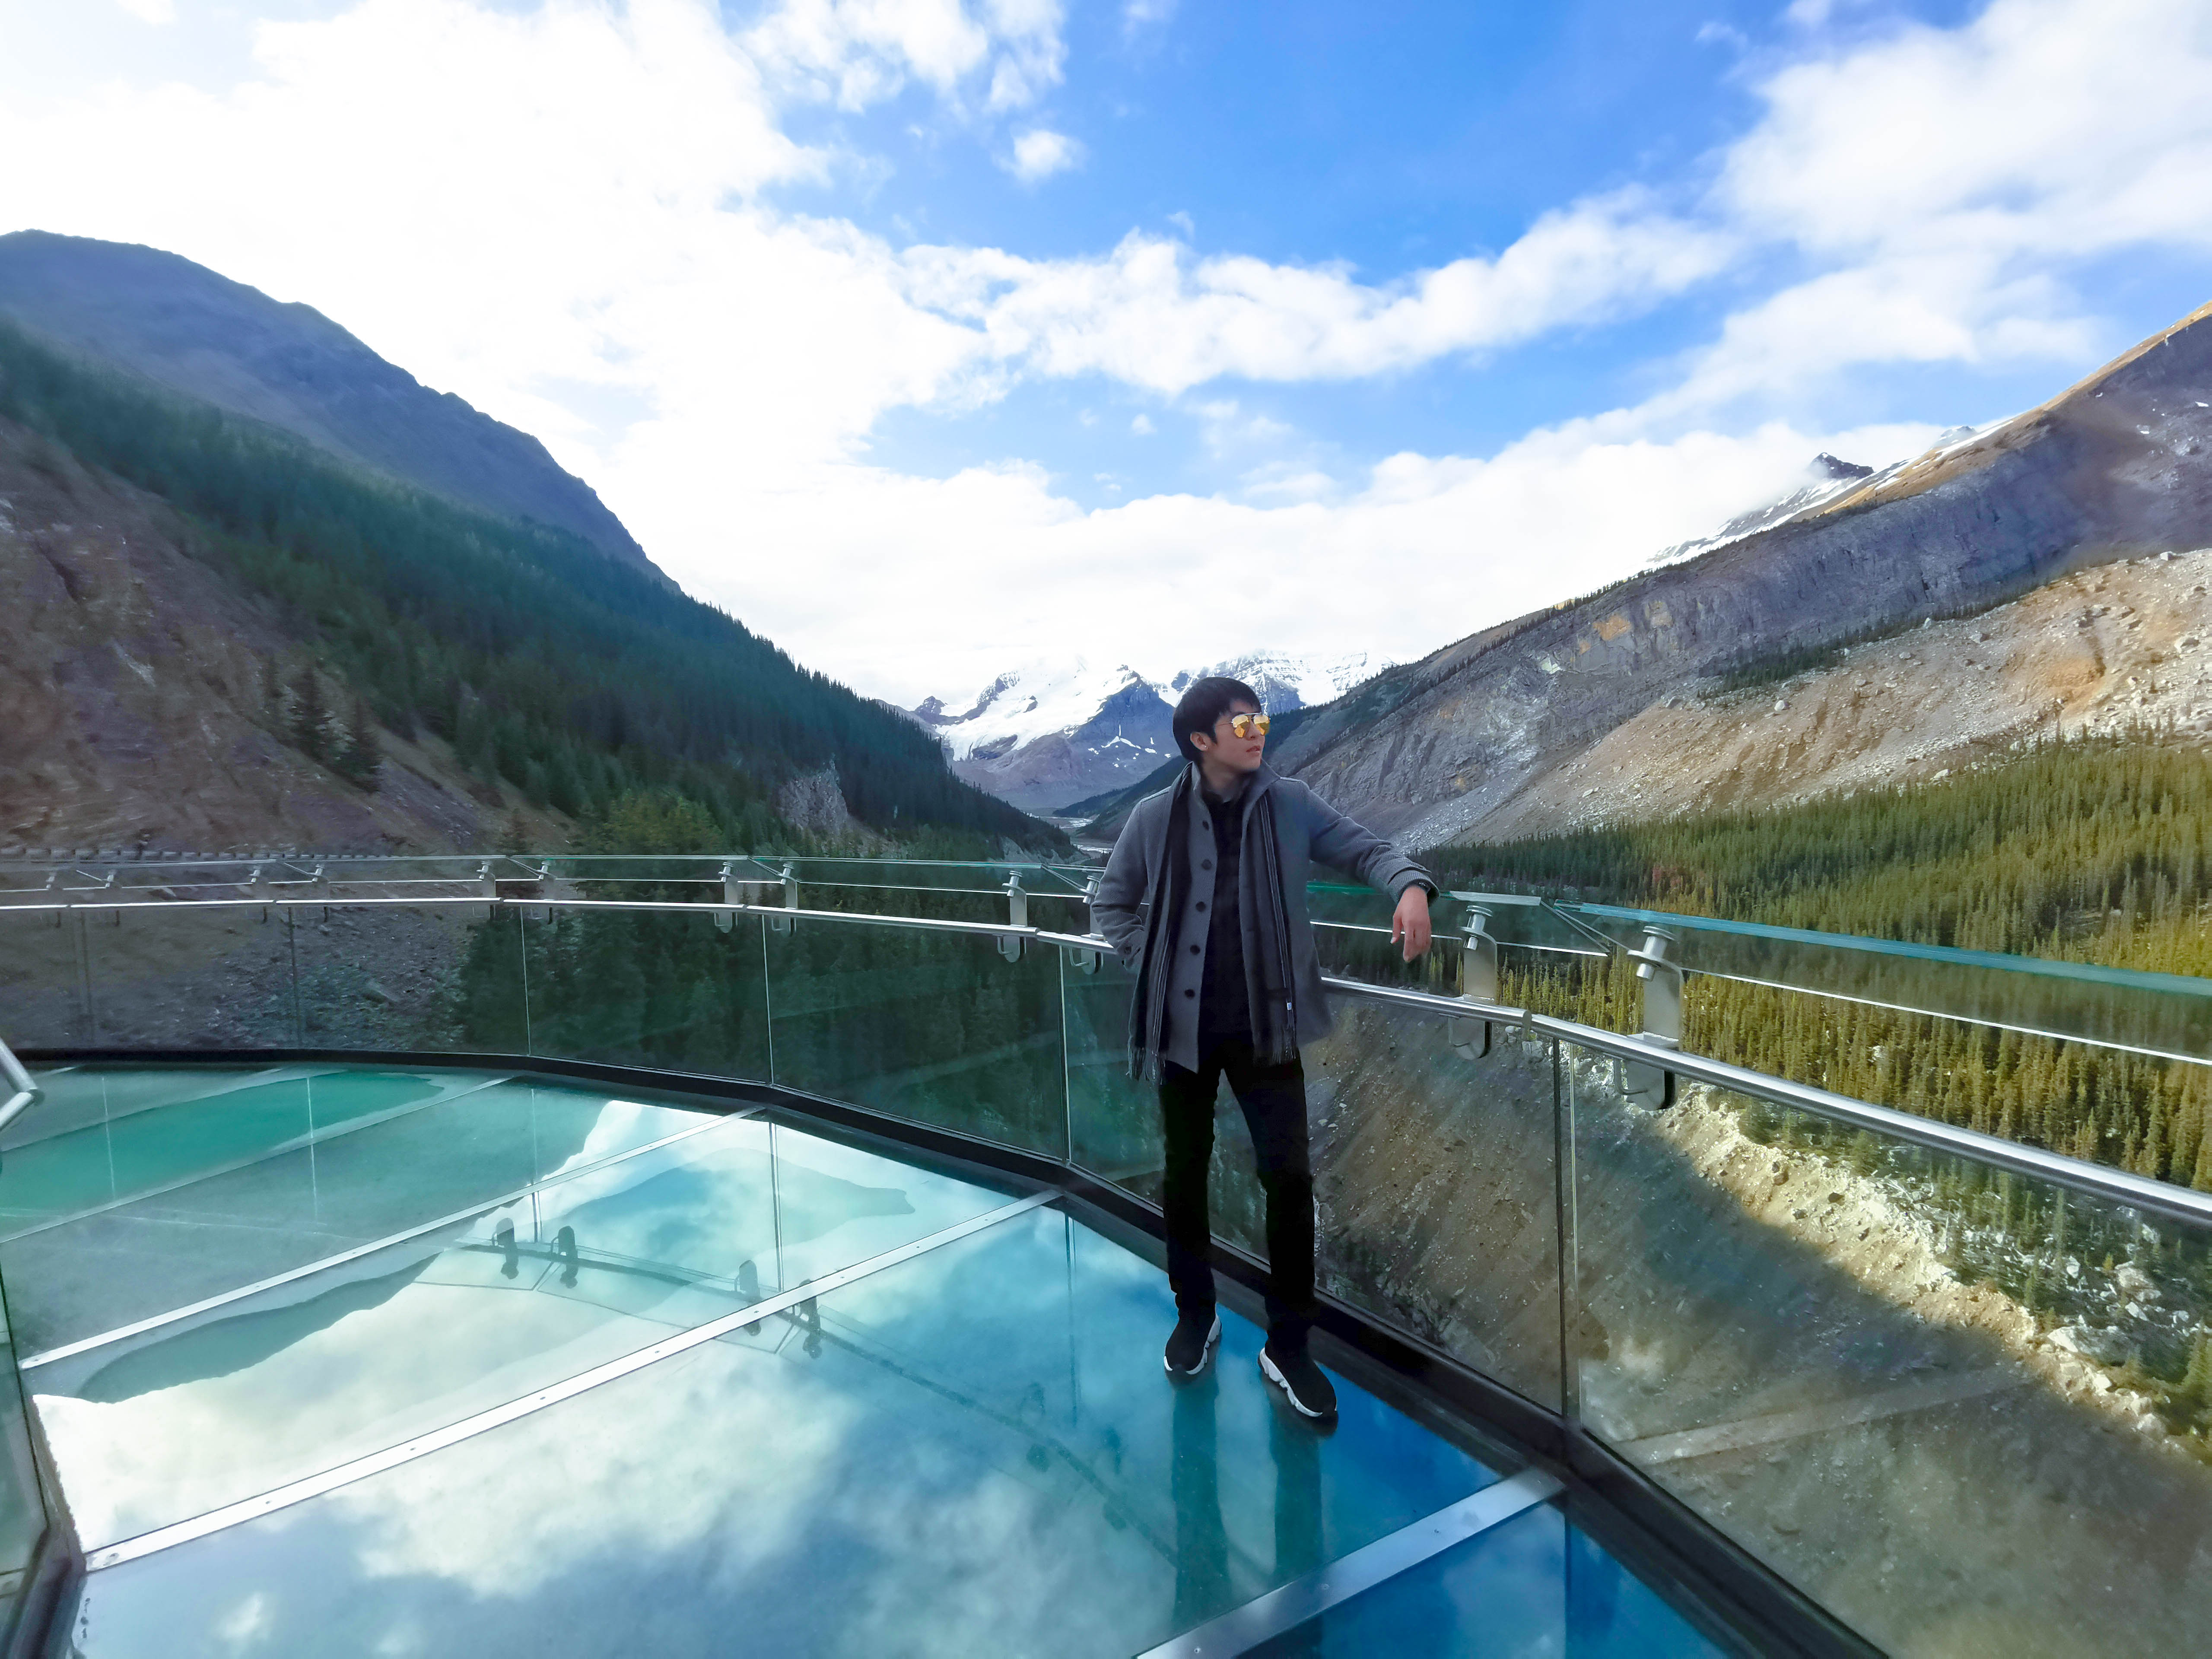 Glacier Skywalk เที่ยวแคนาดา ทัวร์แคนาดา